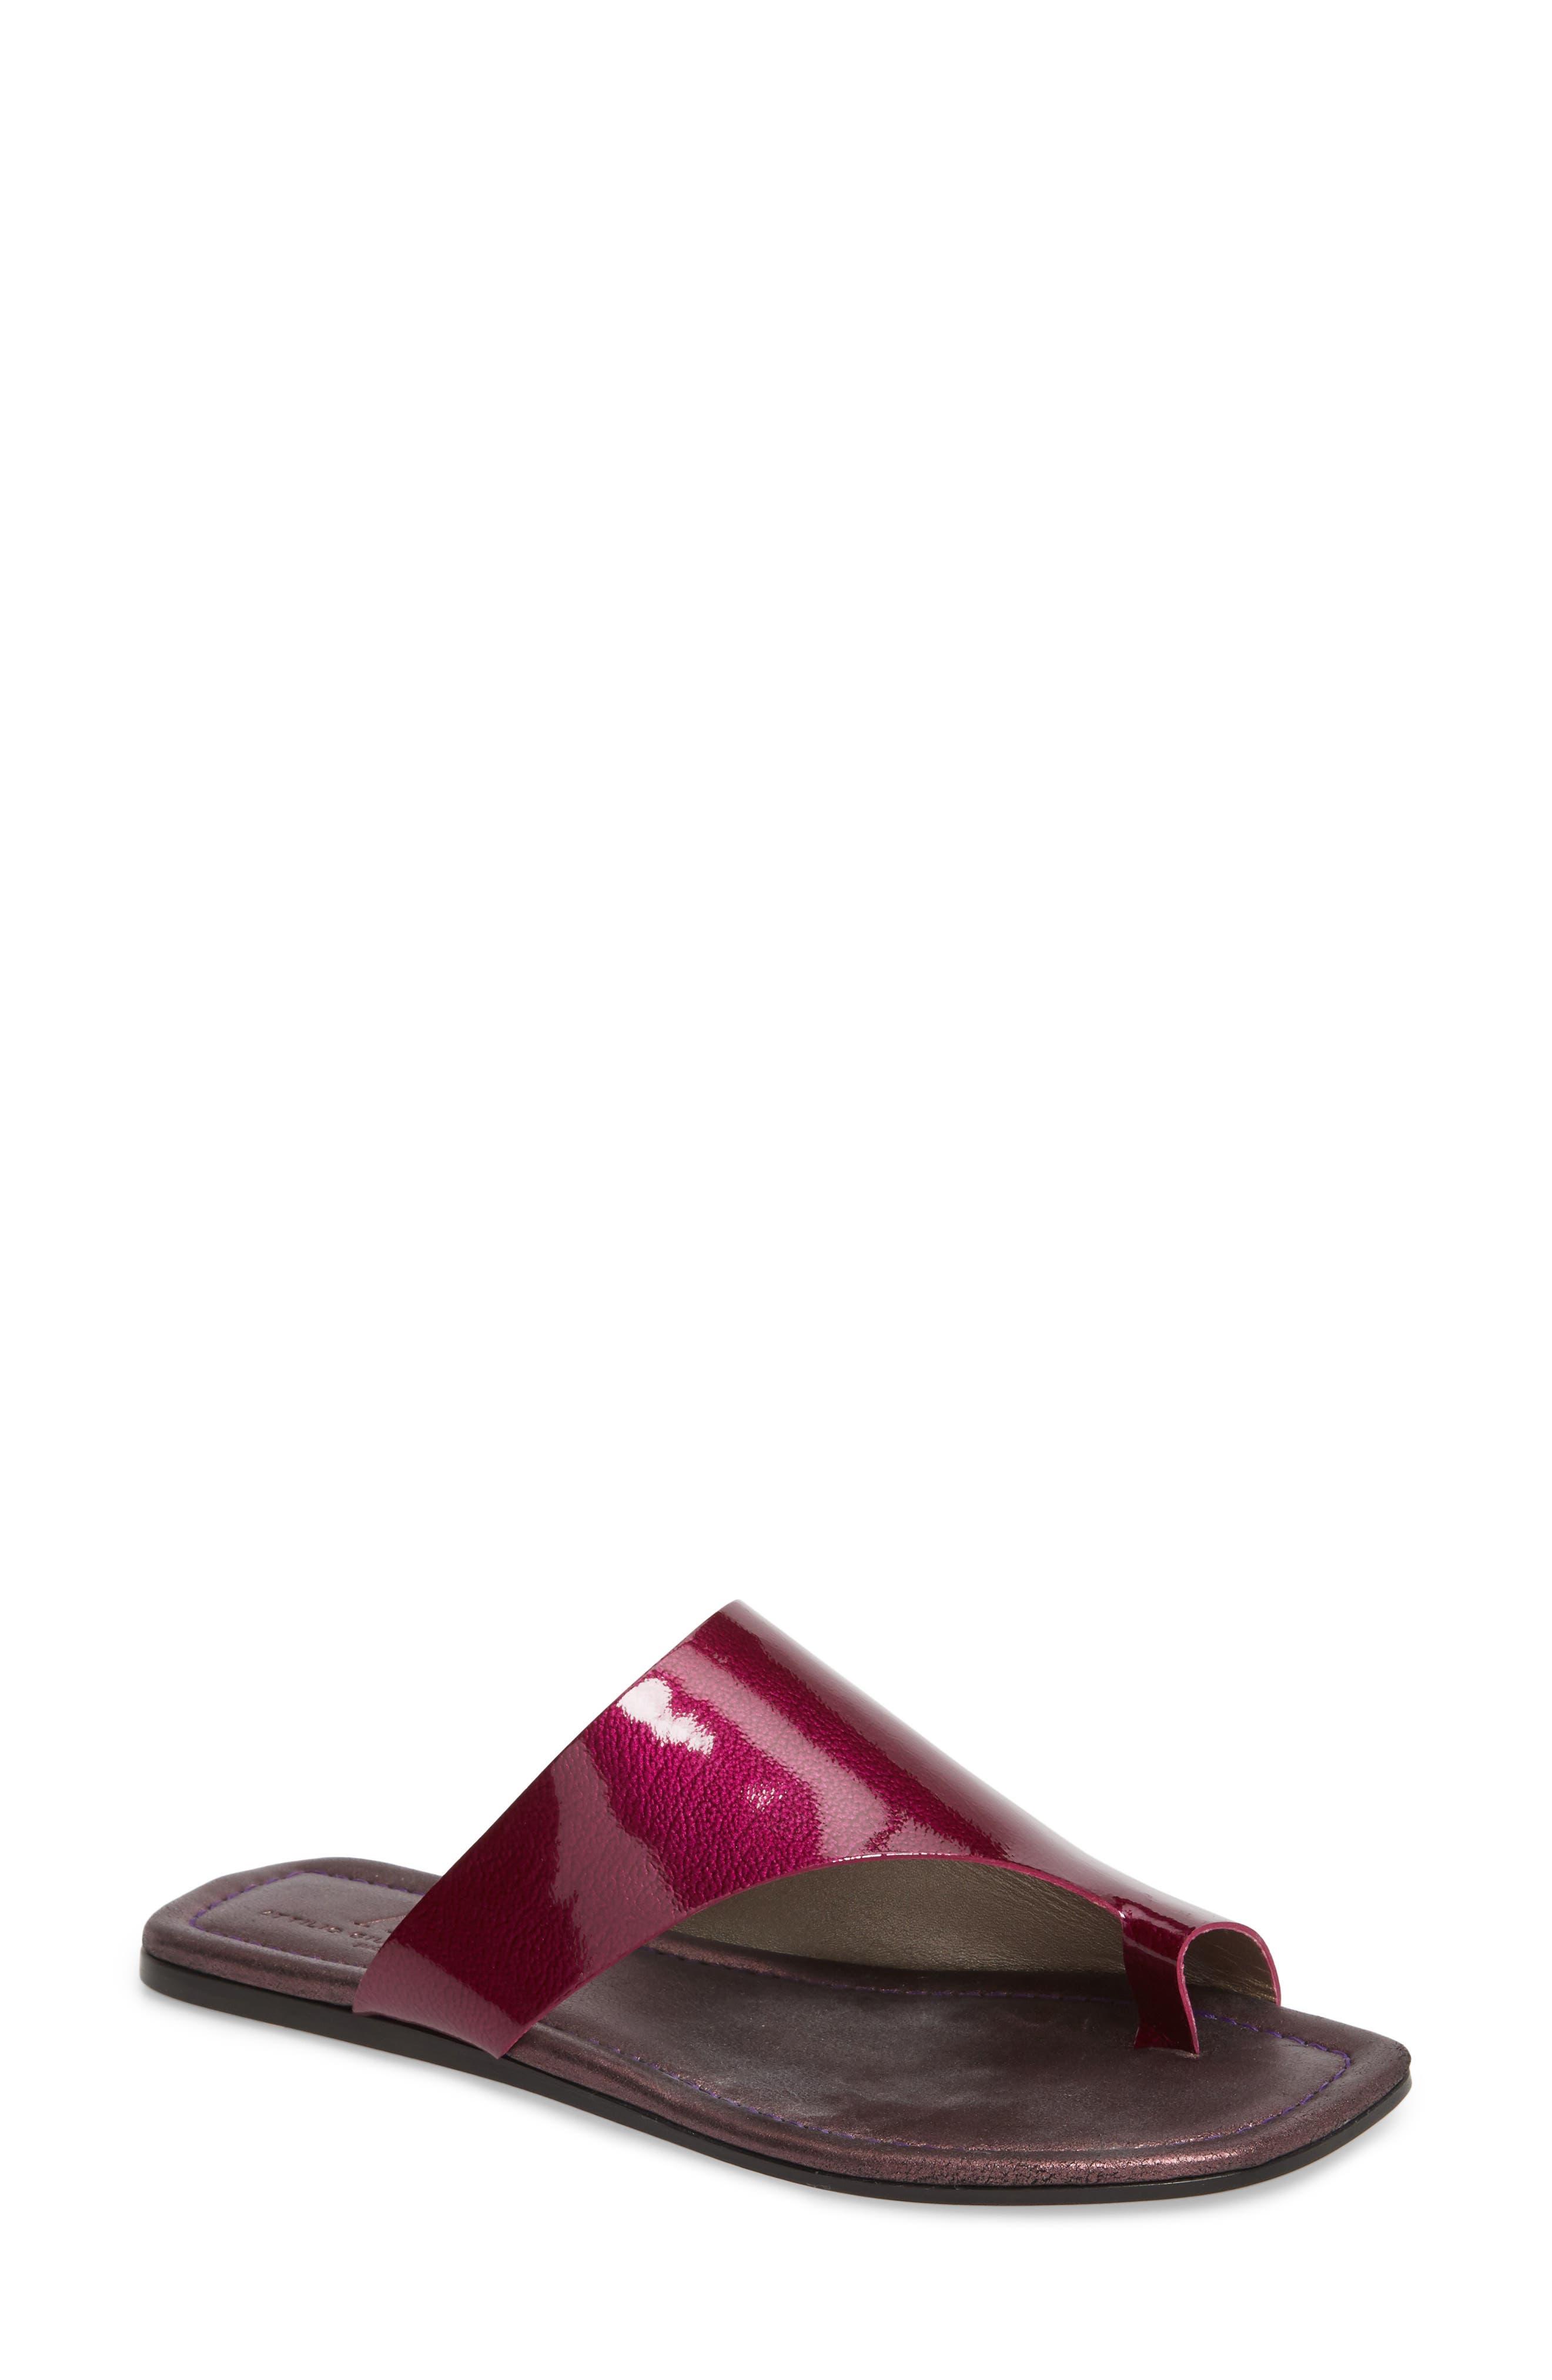 Asymmetrical Toe Thong Sandal,                         Main,                         color, Fuchsia Patent